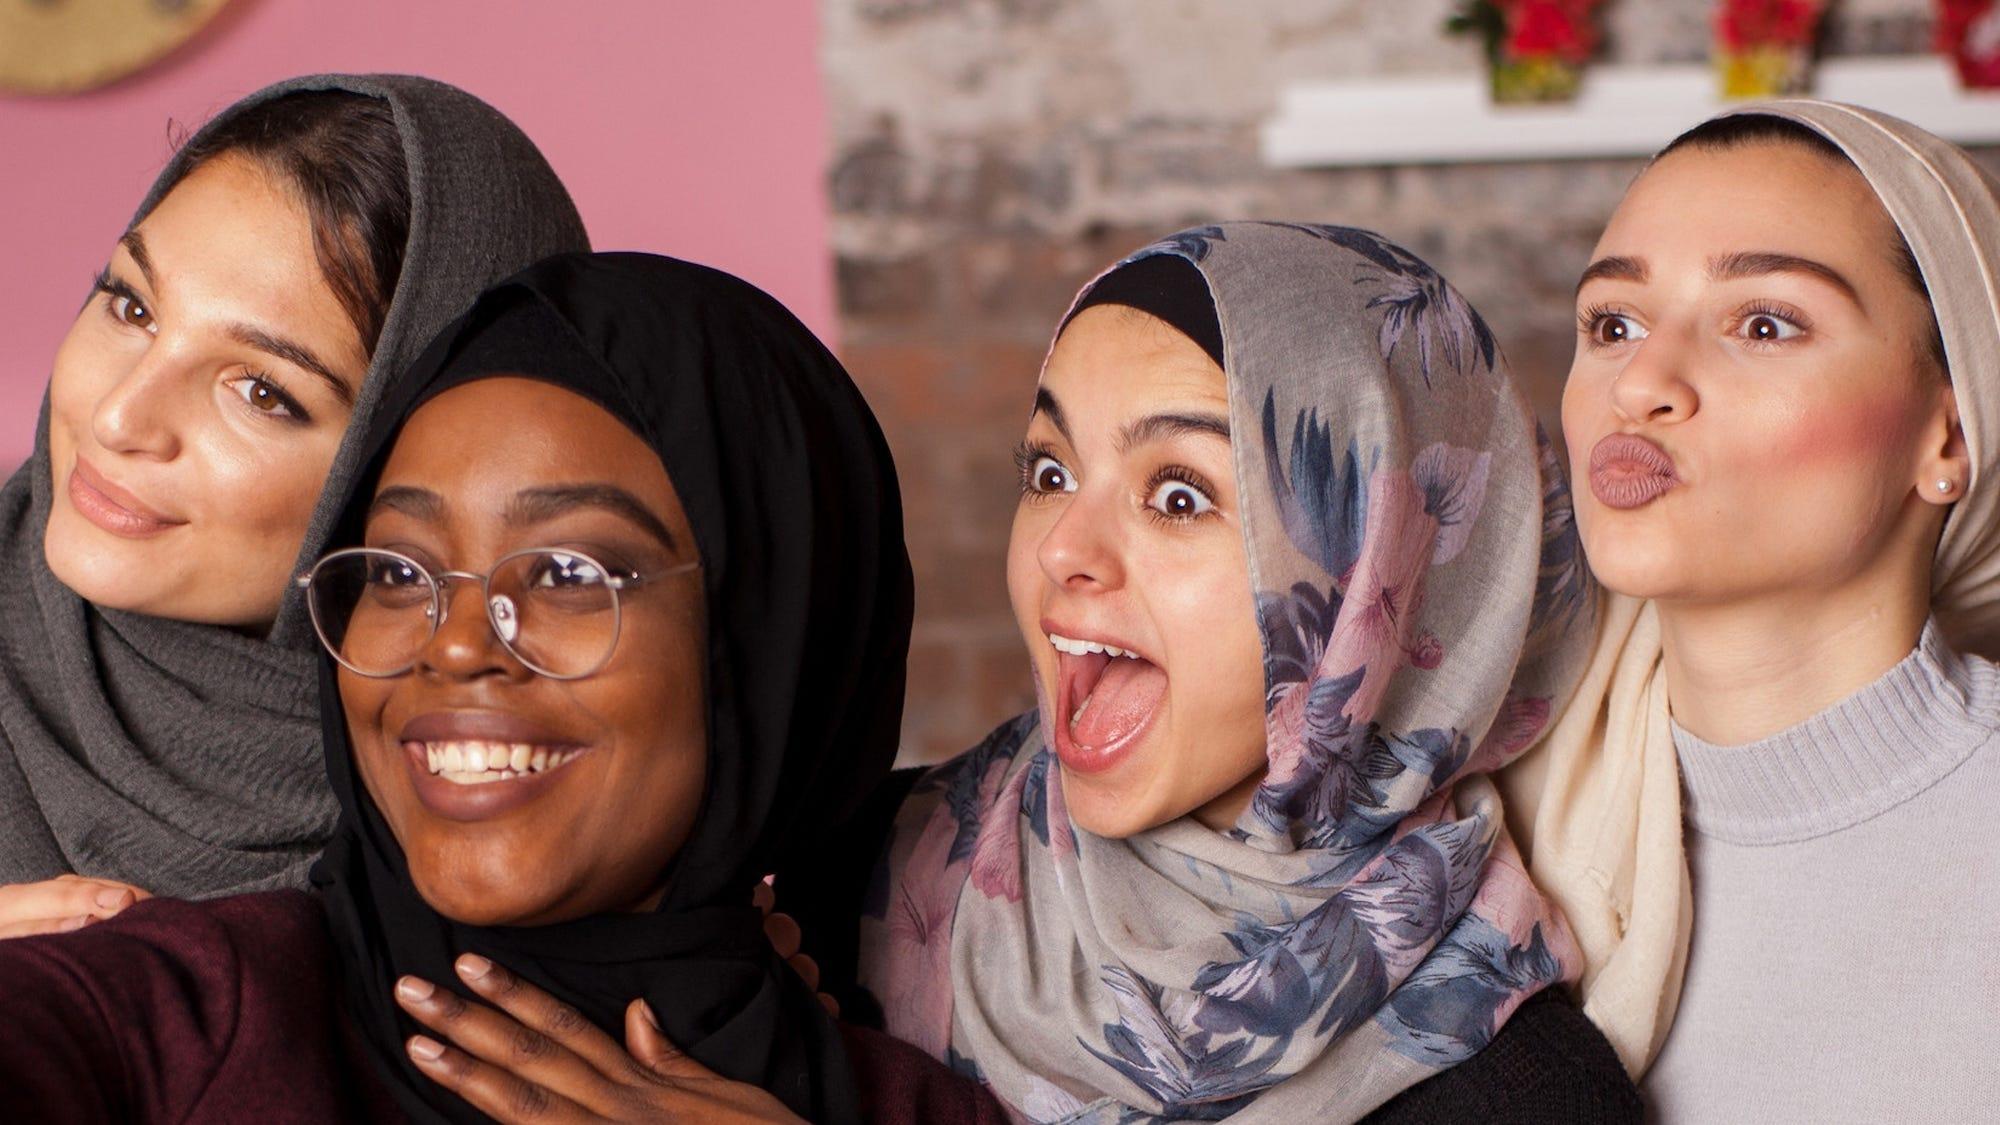 Moslem mehr keine jungfrau Moslem aber